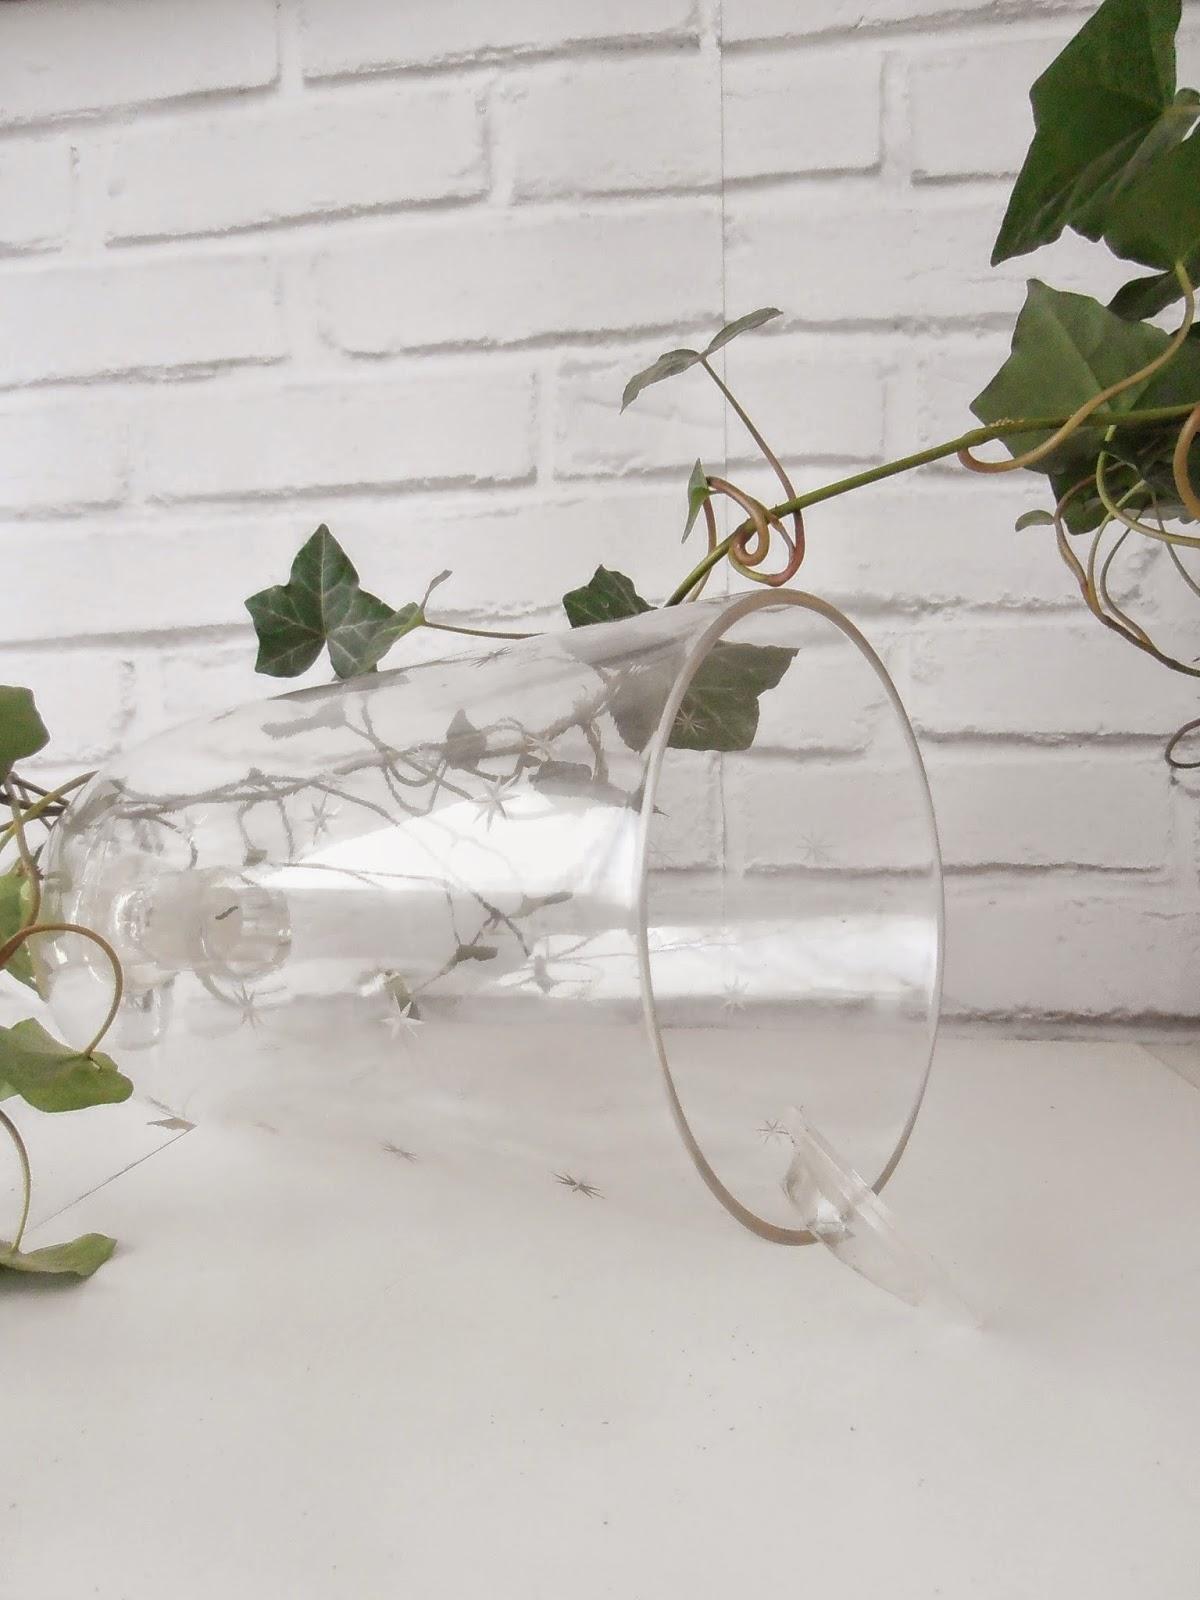 Diy olaimar reciclar un candelabro de cristal